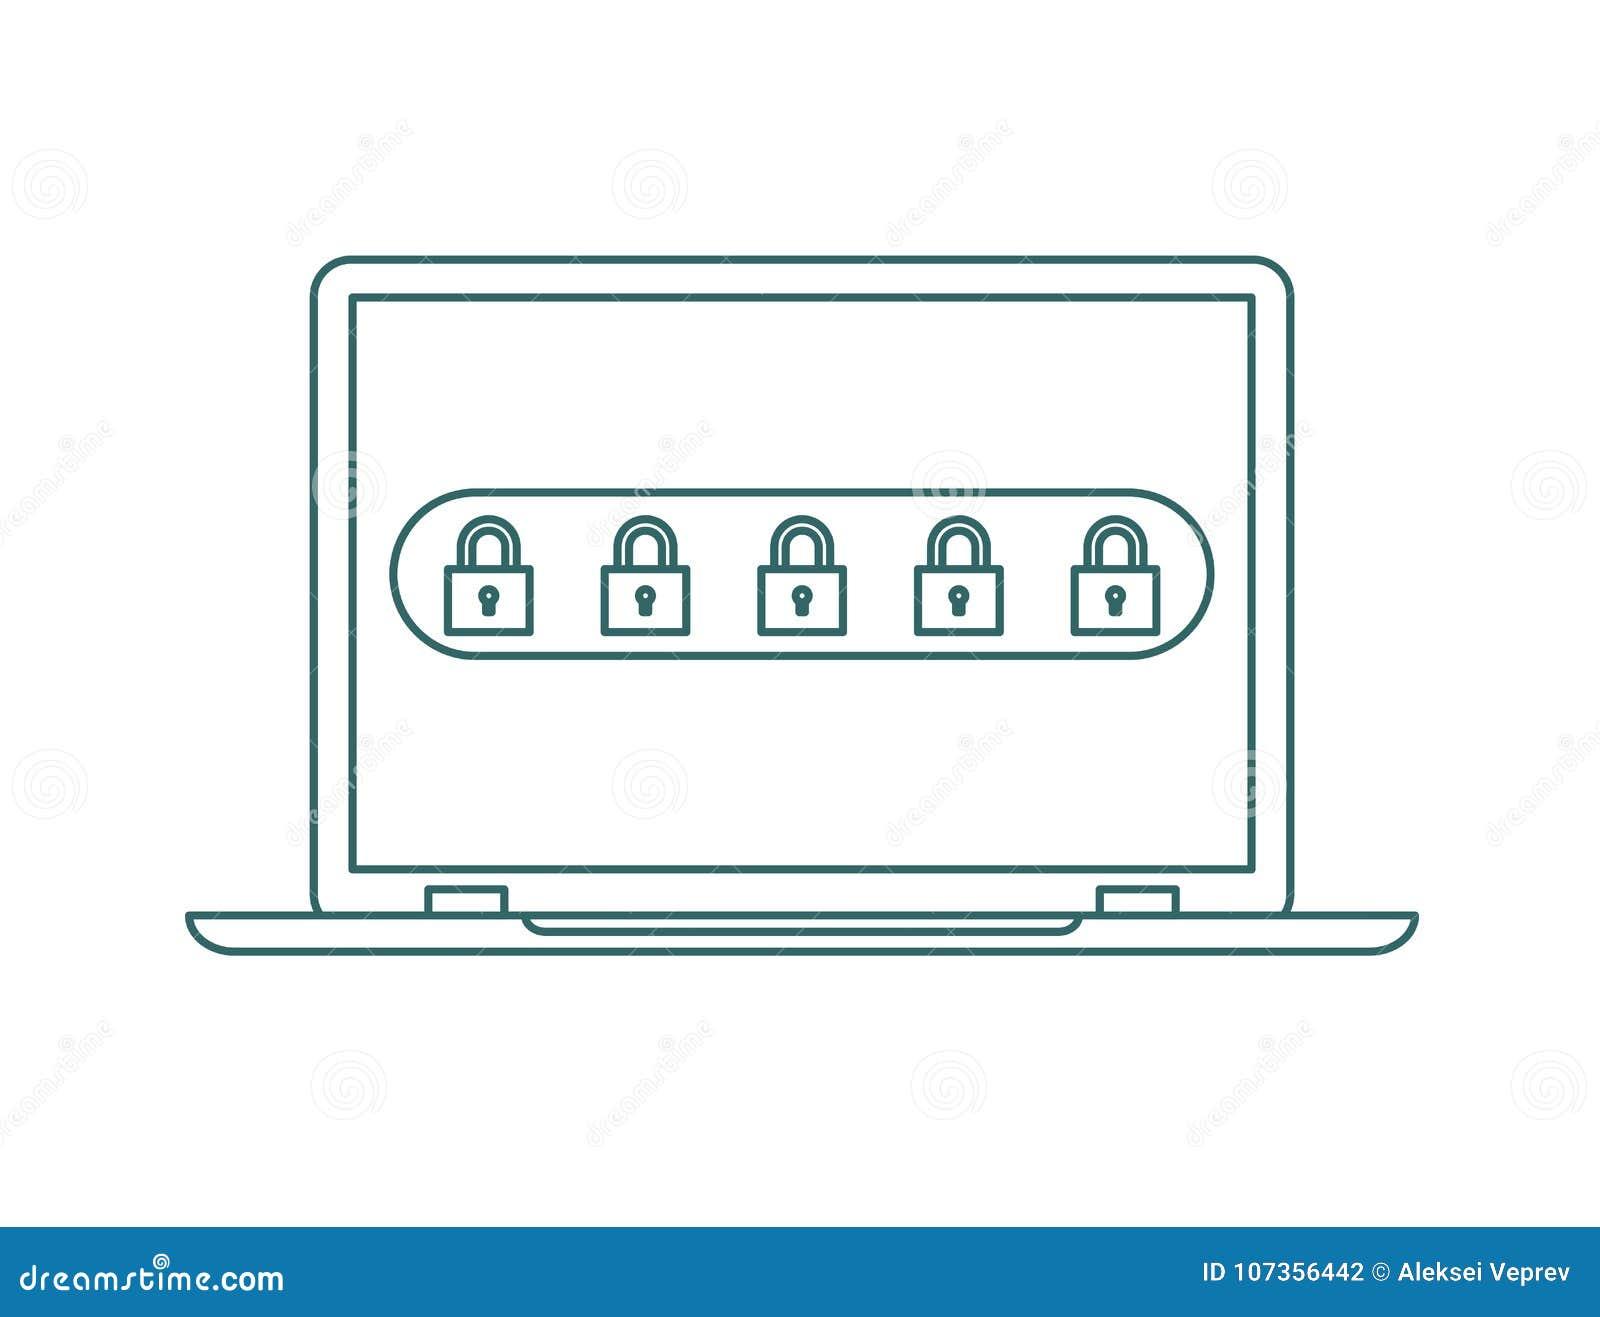 Lap-top με την ανακοίνωση κωδικού πρόσβασης και το εικονίδιο κλειδαριών